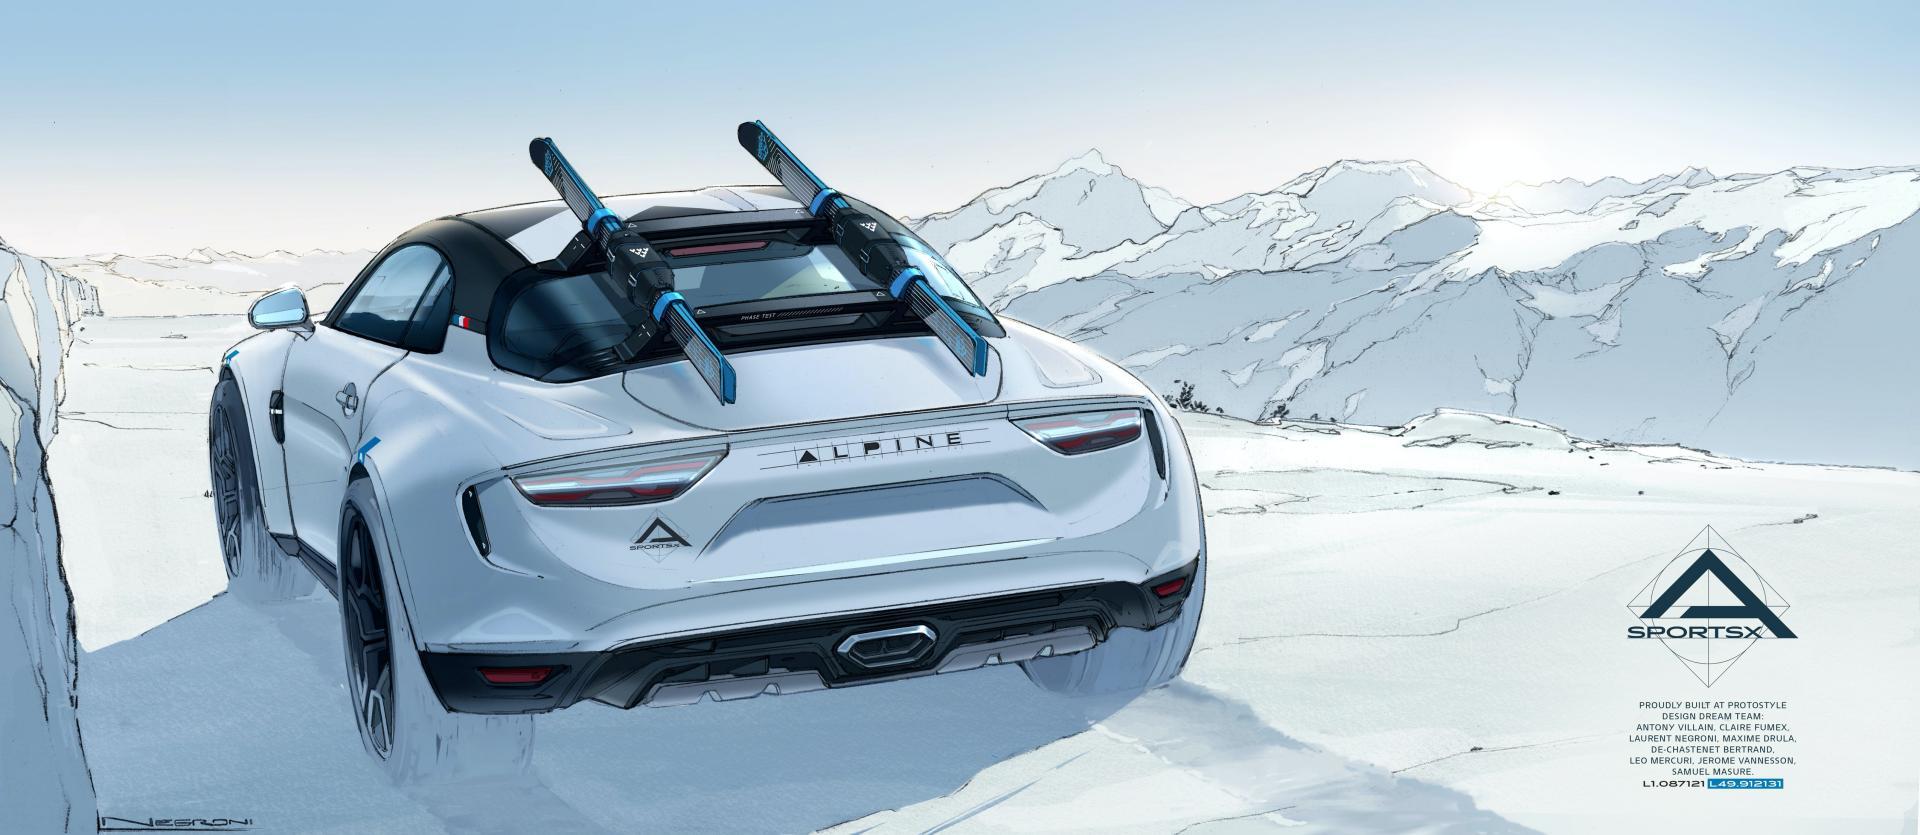 Alpine-A110-SportsX-11